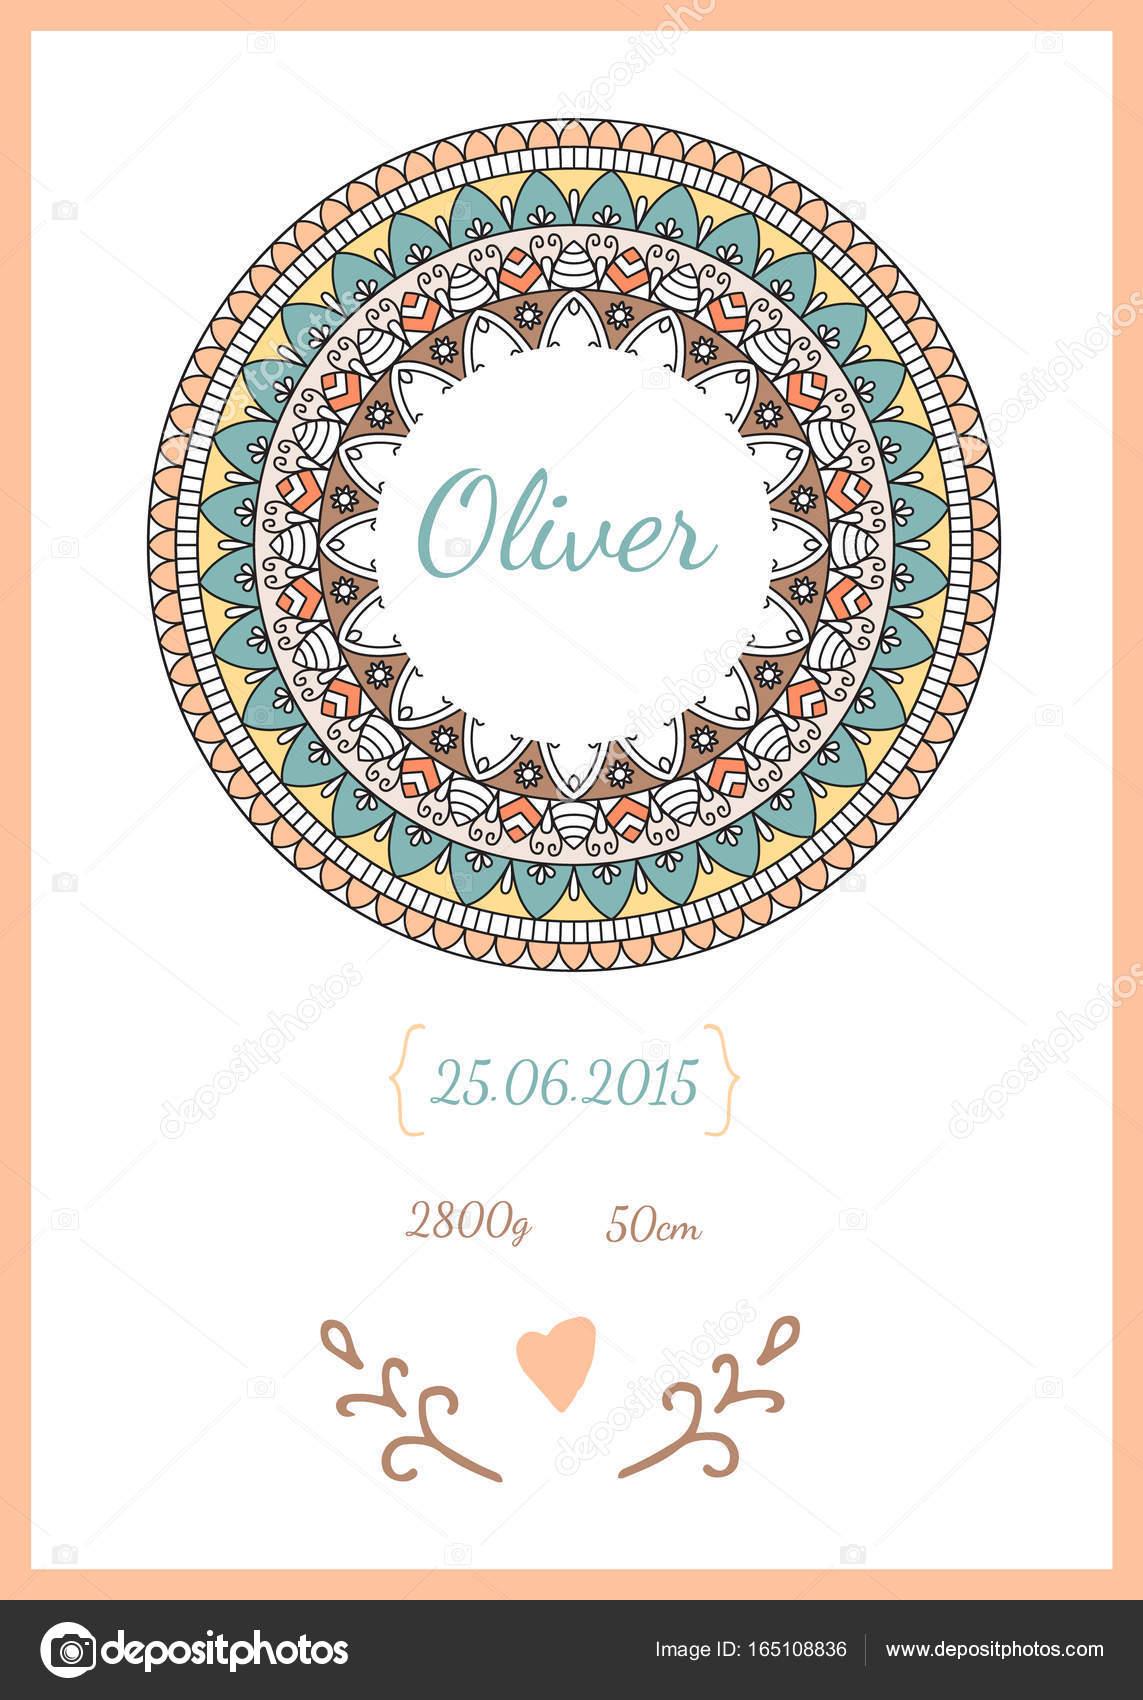 Baby Happy Birthday Card With Data Stock Vector 0112angel 165108836